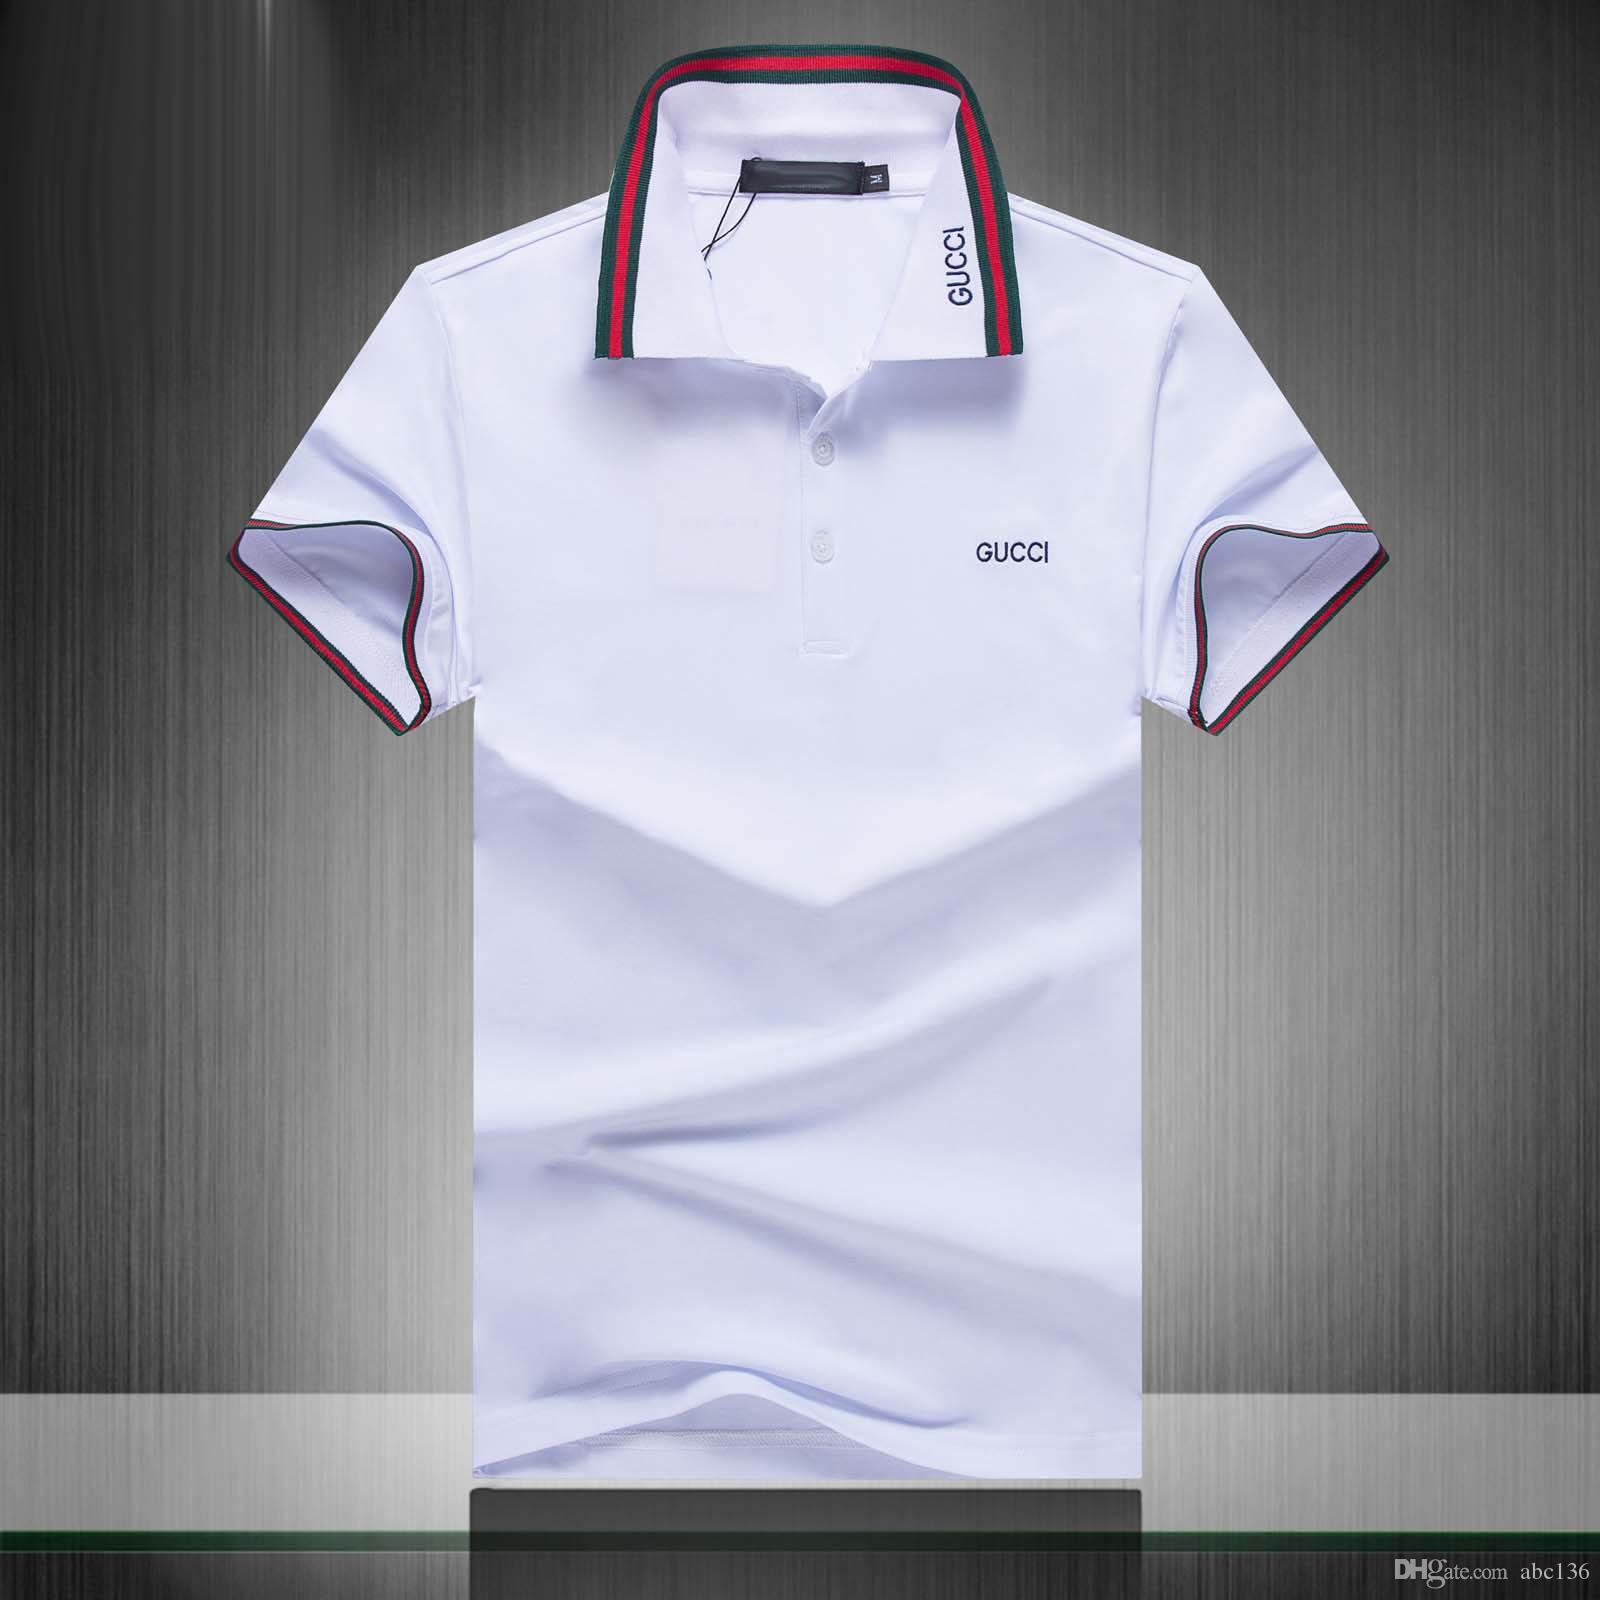 Diseñador de la marca Polo de verano Bordado Camisetas de polo para hombre Camisa de estilo de moda para hombres Mujeres High Street Top Tee42